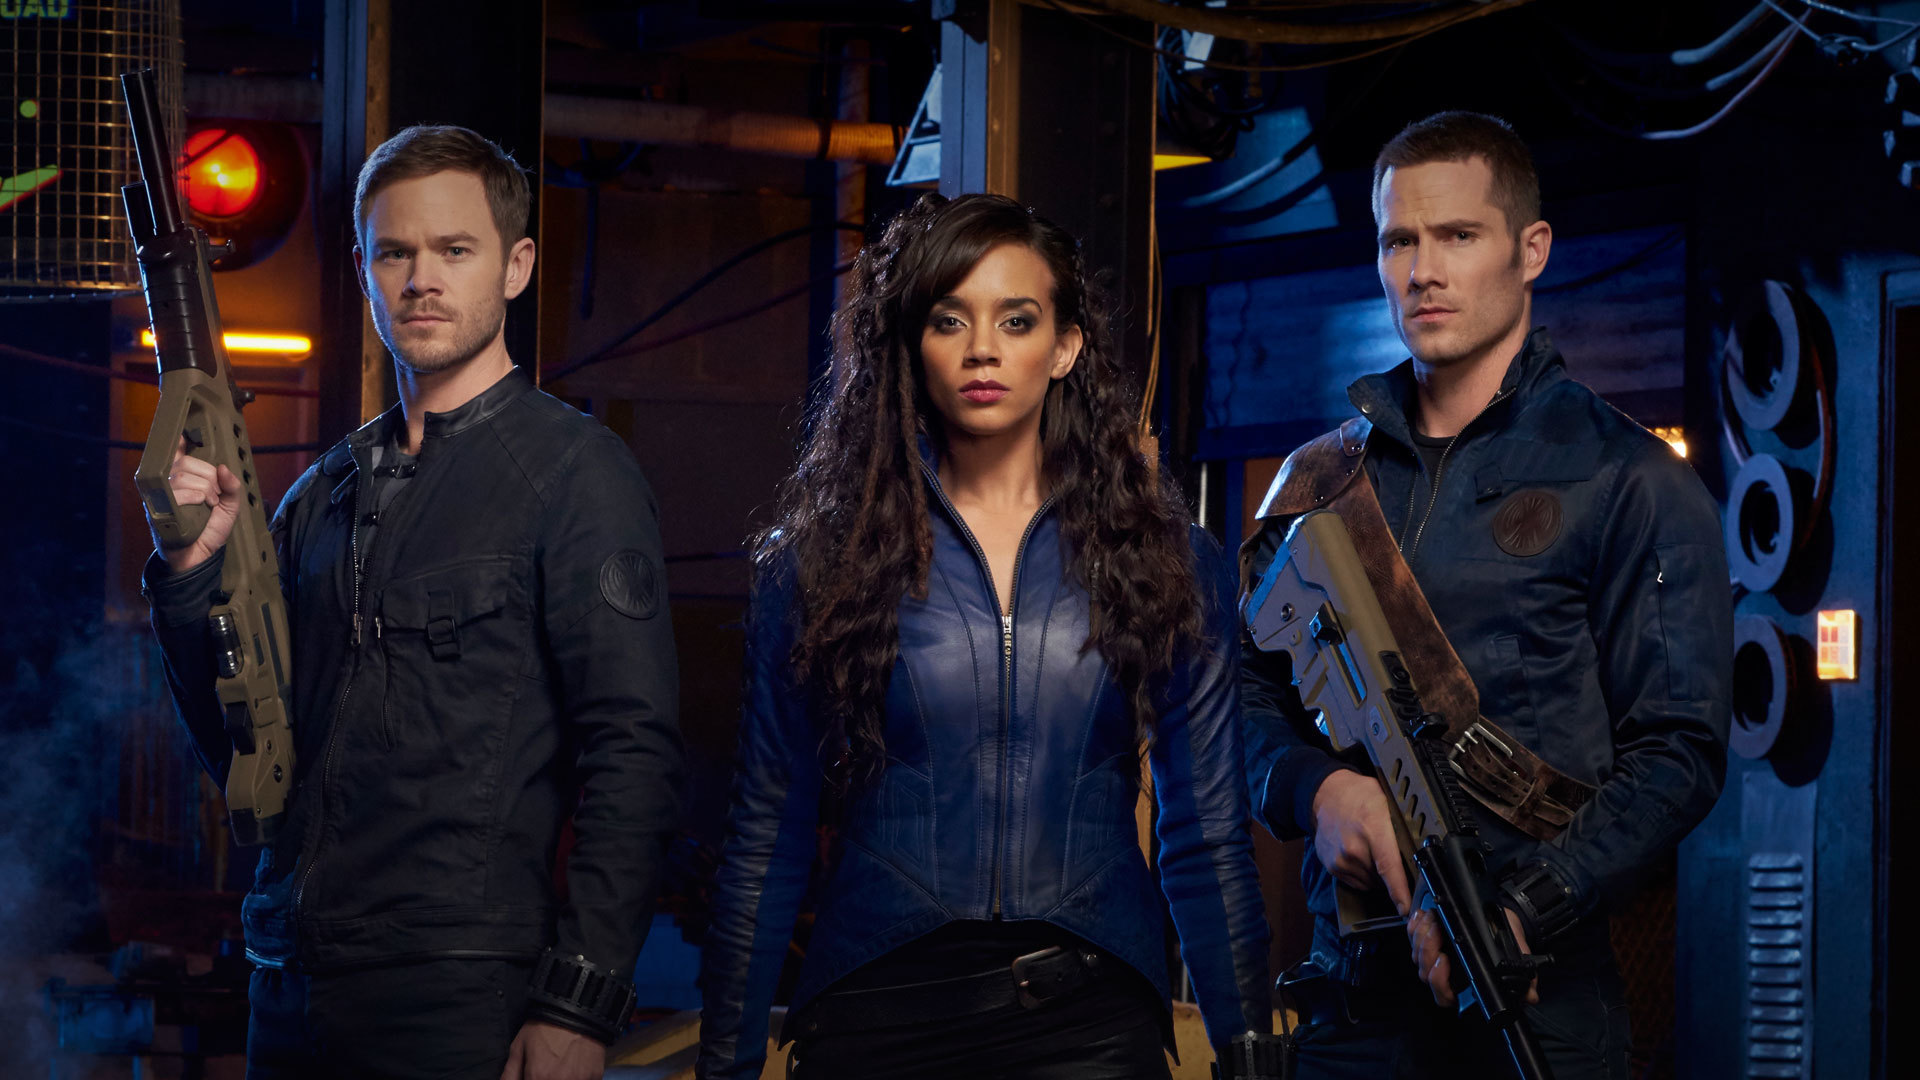 Wallpaper Killjoys TV series, Hannah John-Kamenm, Aaron Ashmore, Luke Macfarlane, casts